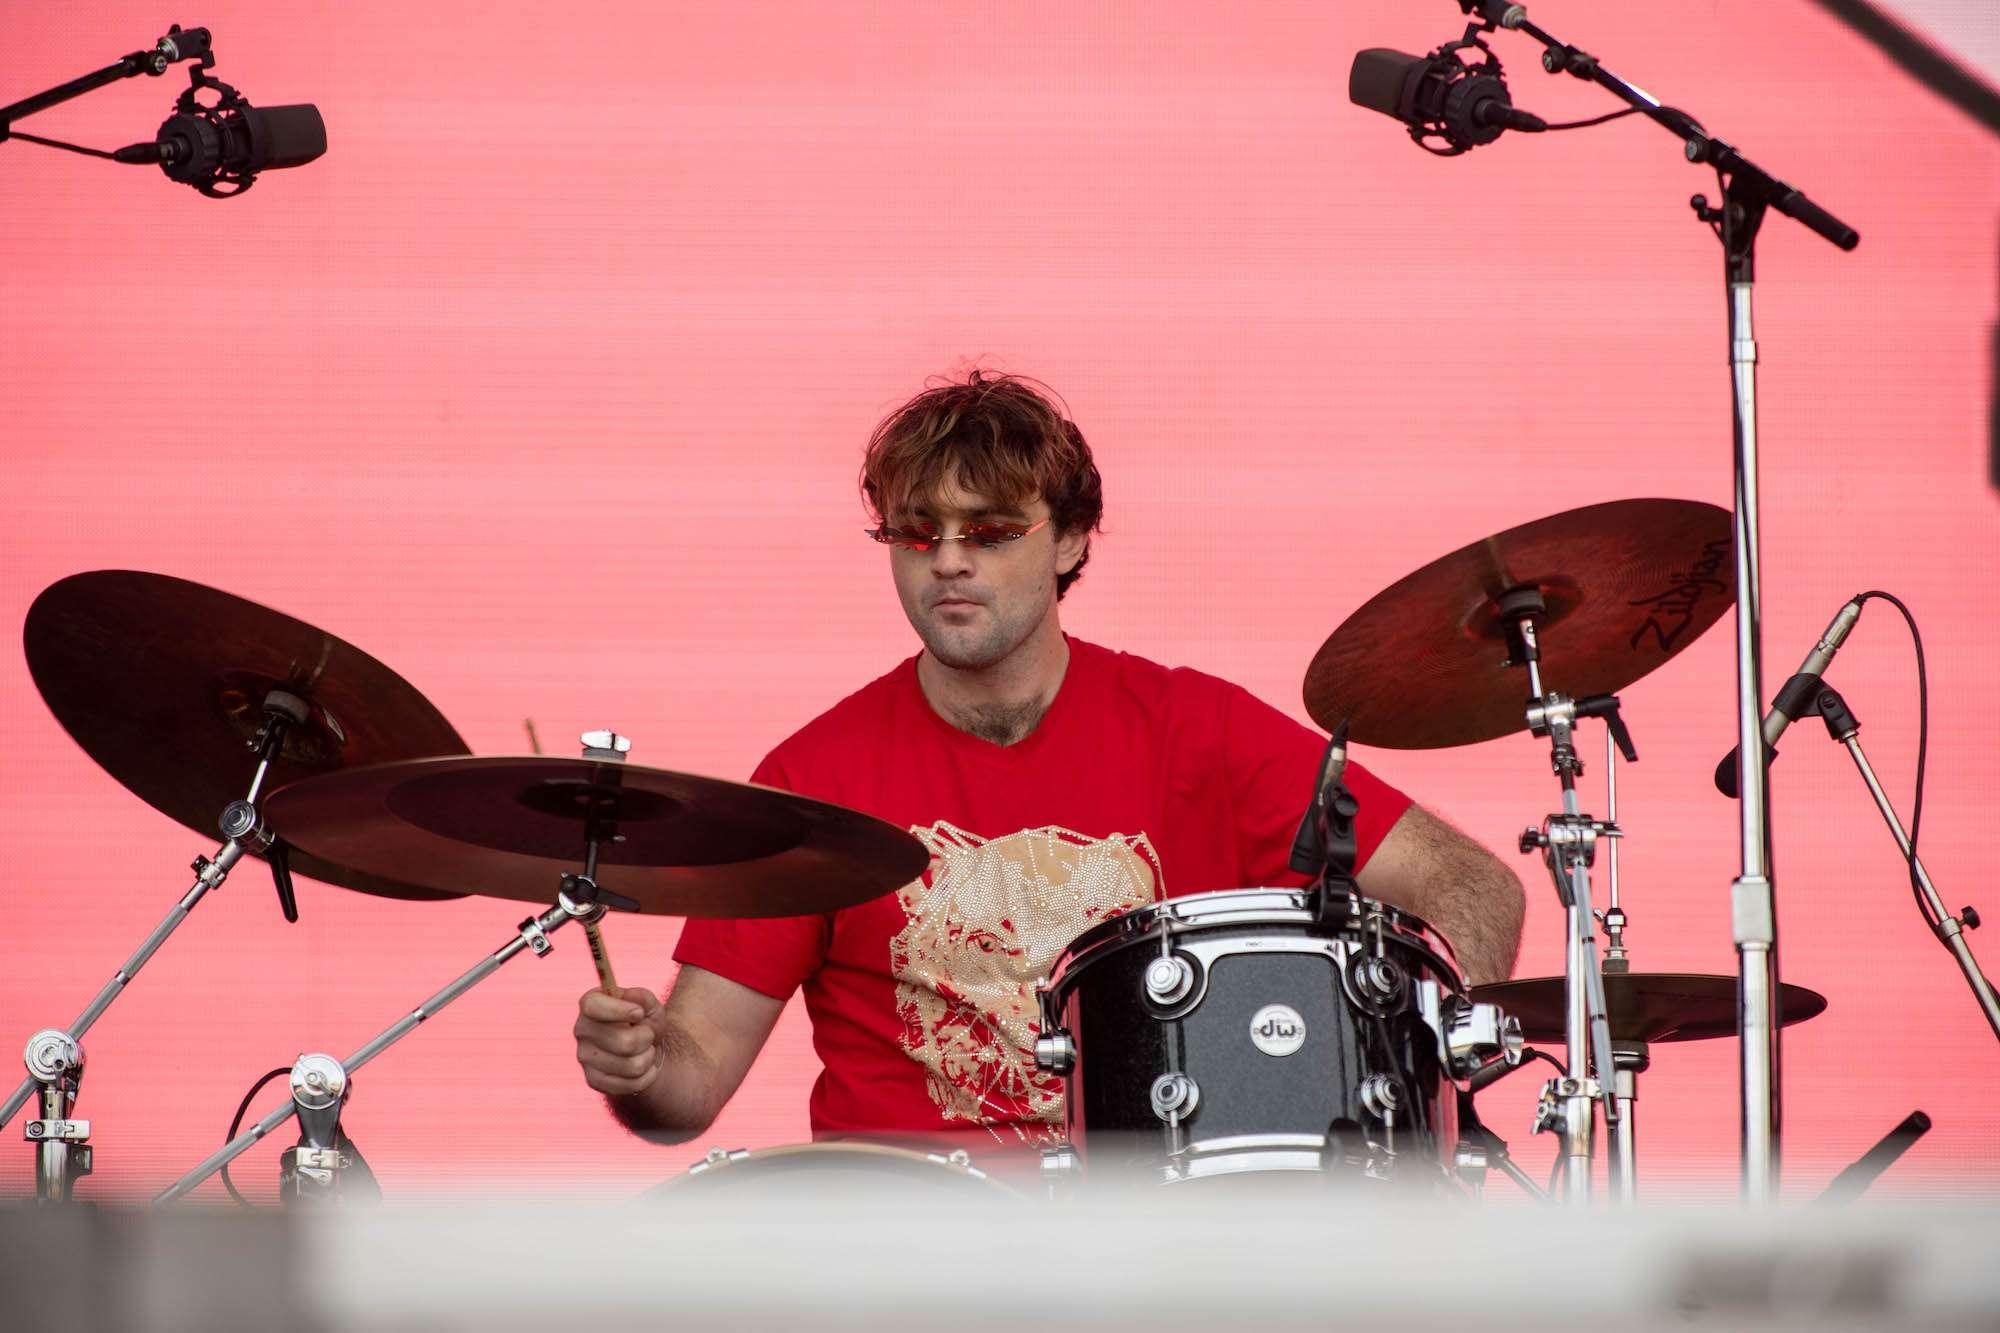 Sir Chloe Live at Lollapalooza [GALLERY] 5